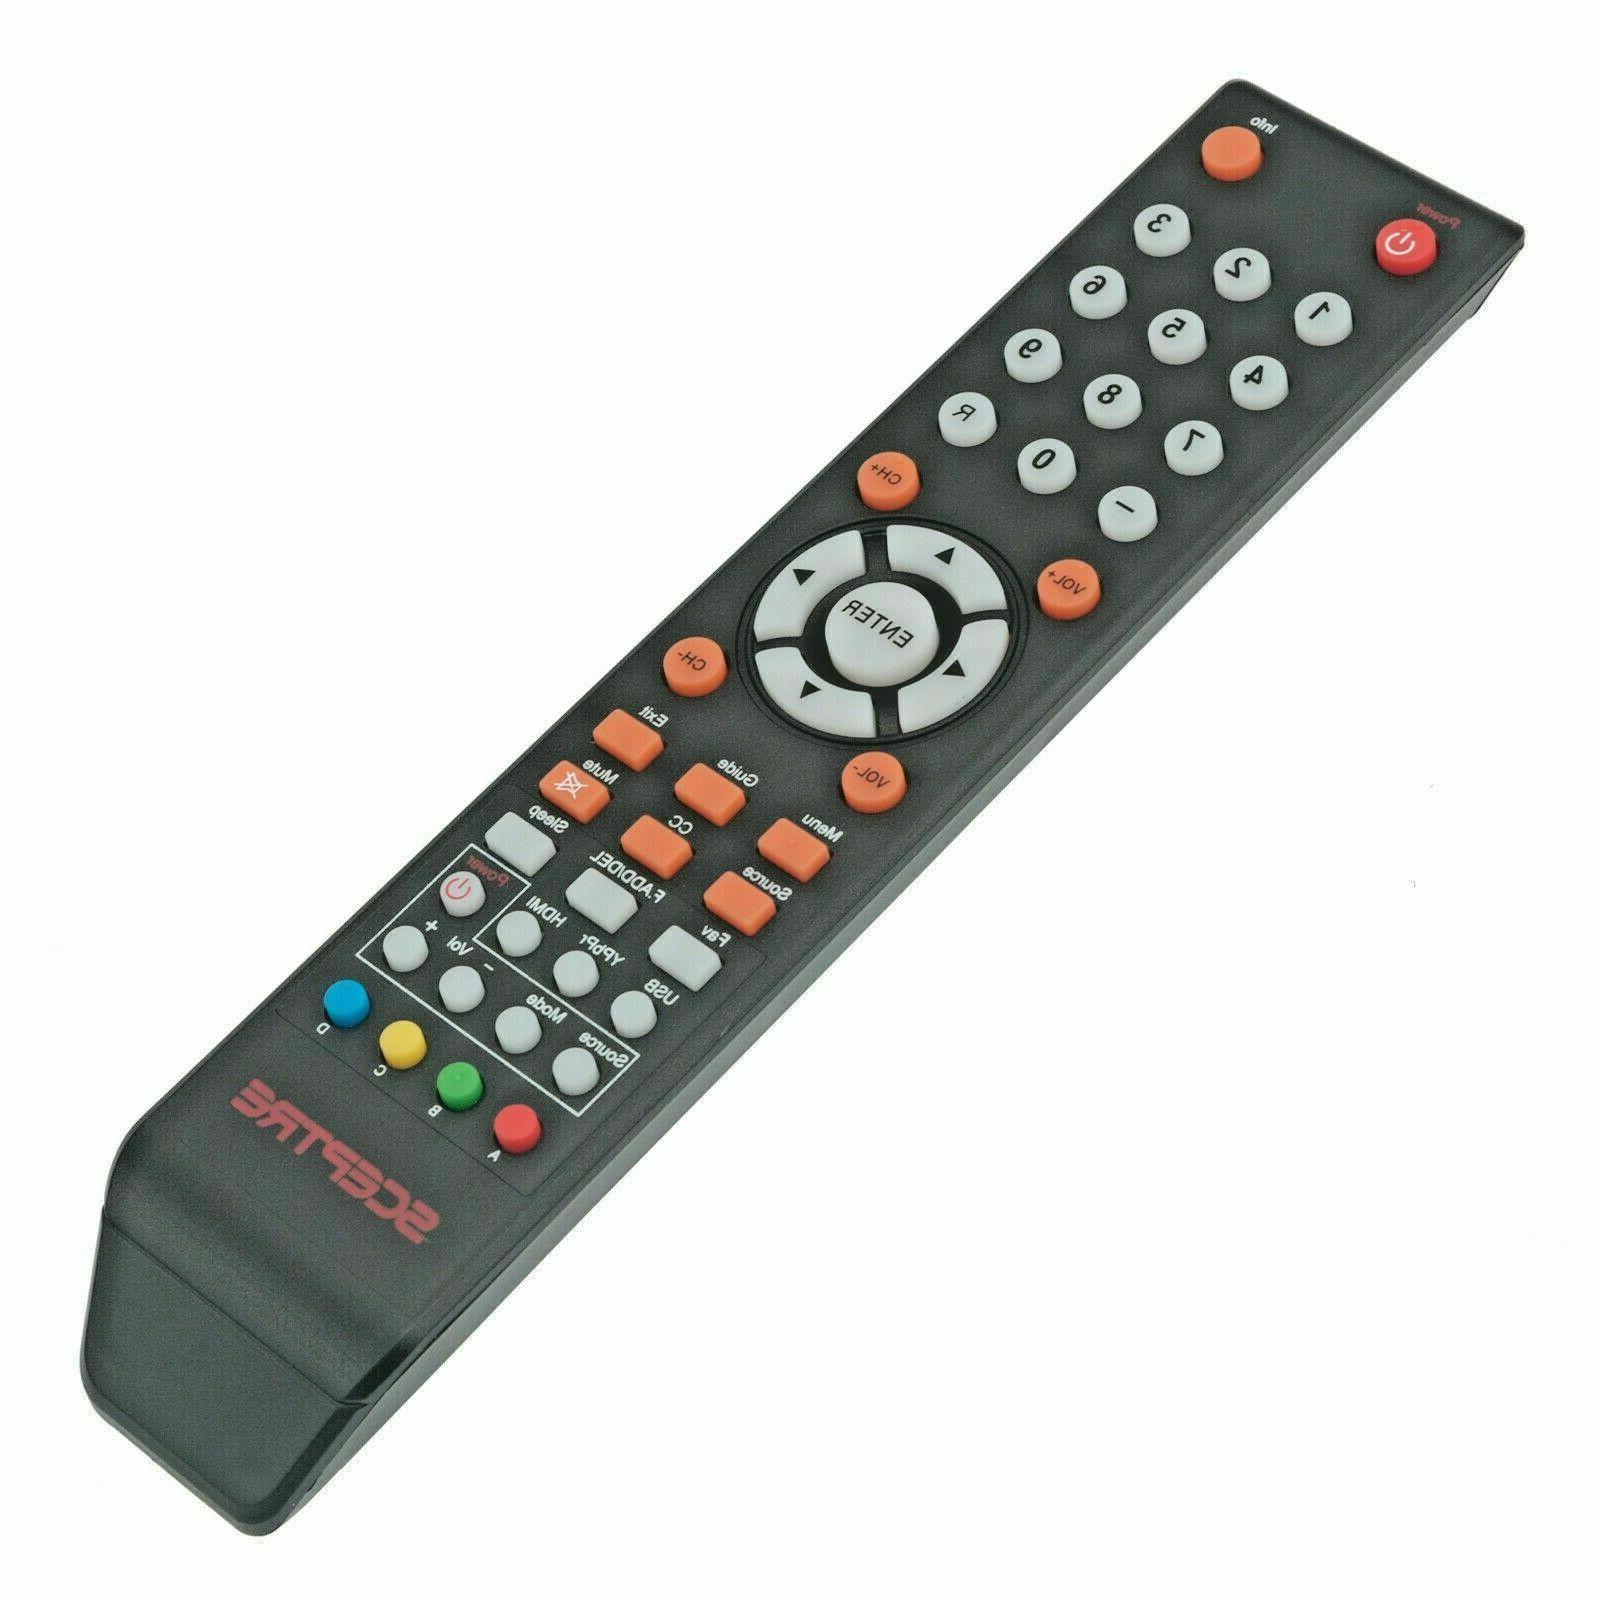 New SCEPTRE TV Remote Control 8142026670003C LED LCD TV X505